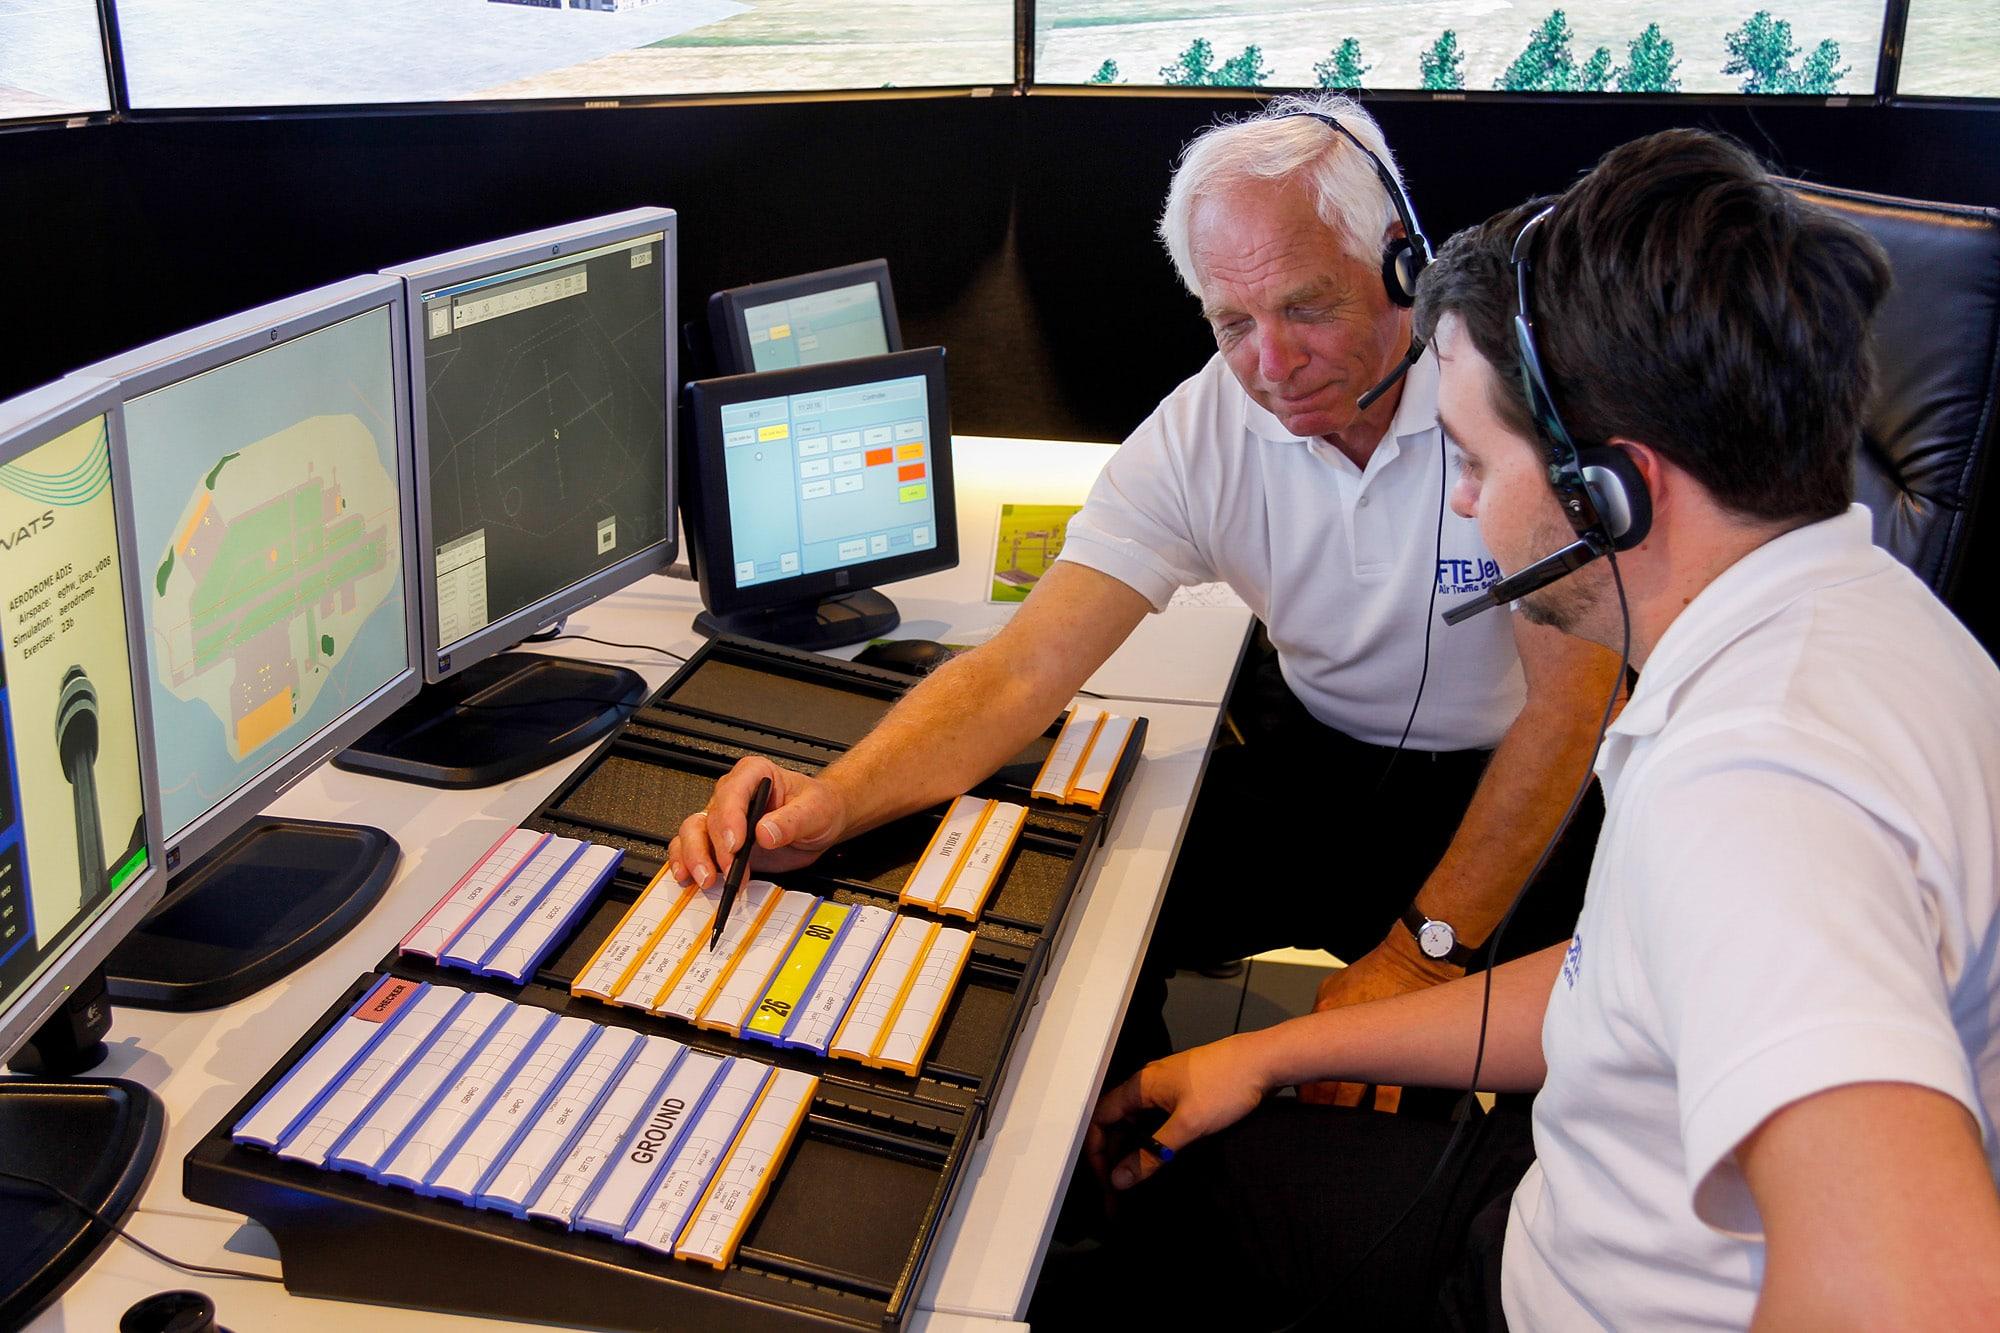 fte jerez air traffic controller recruitment event